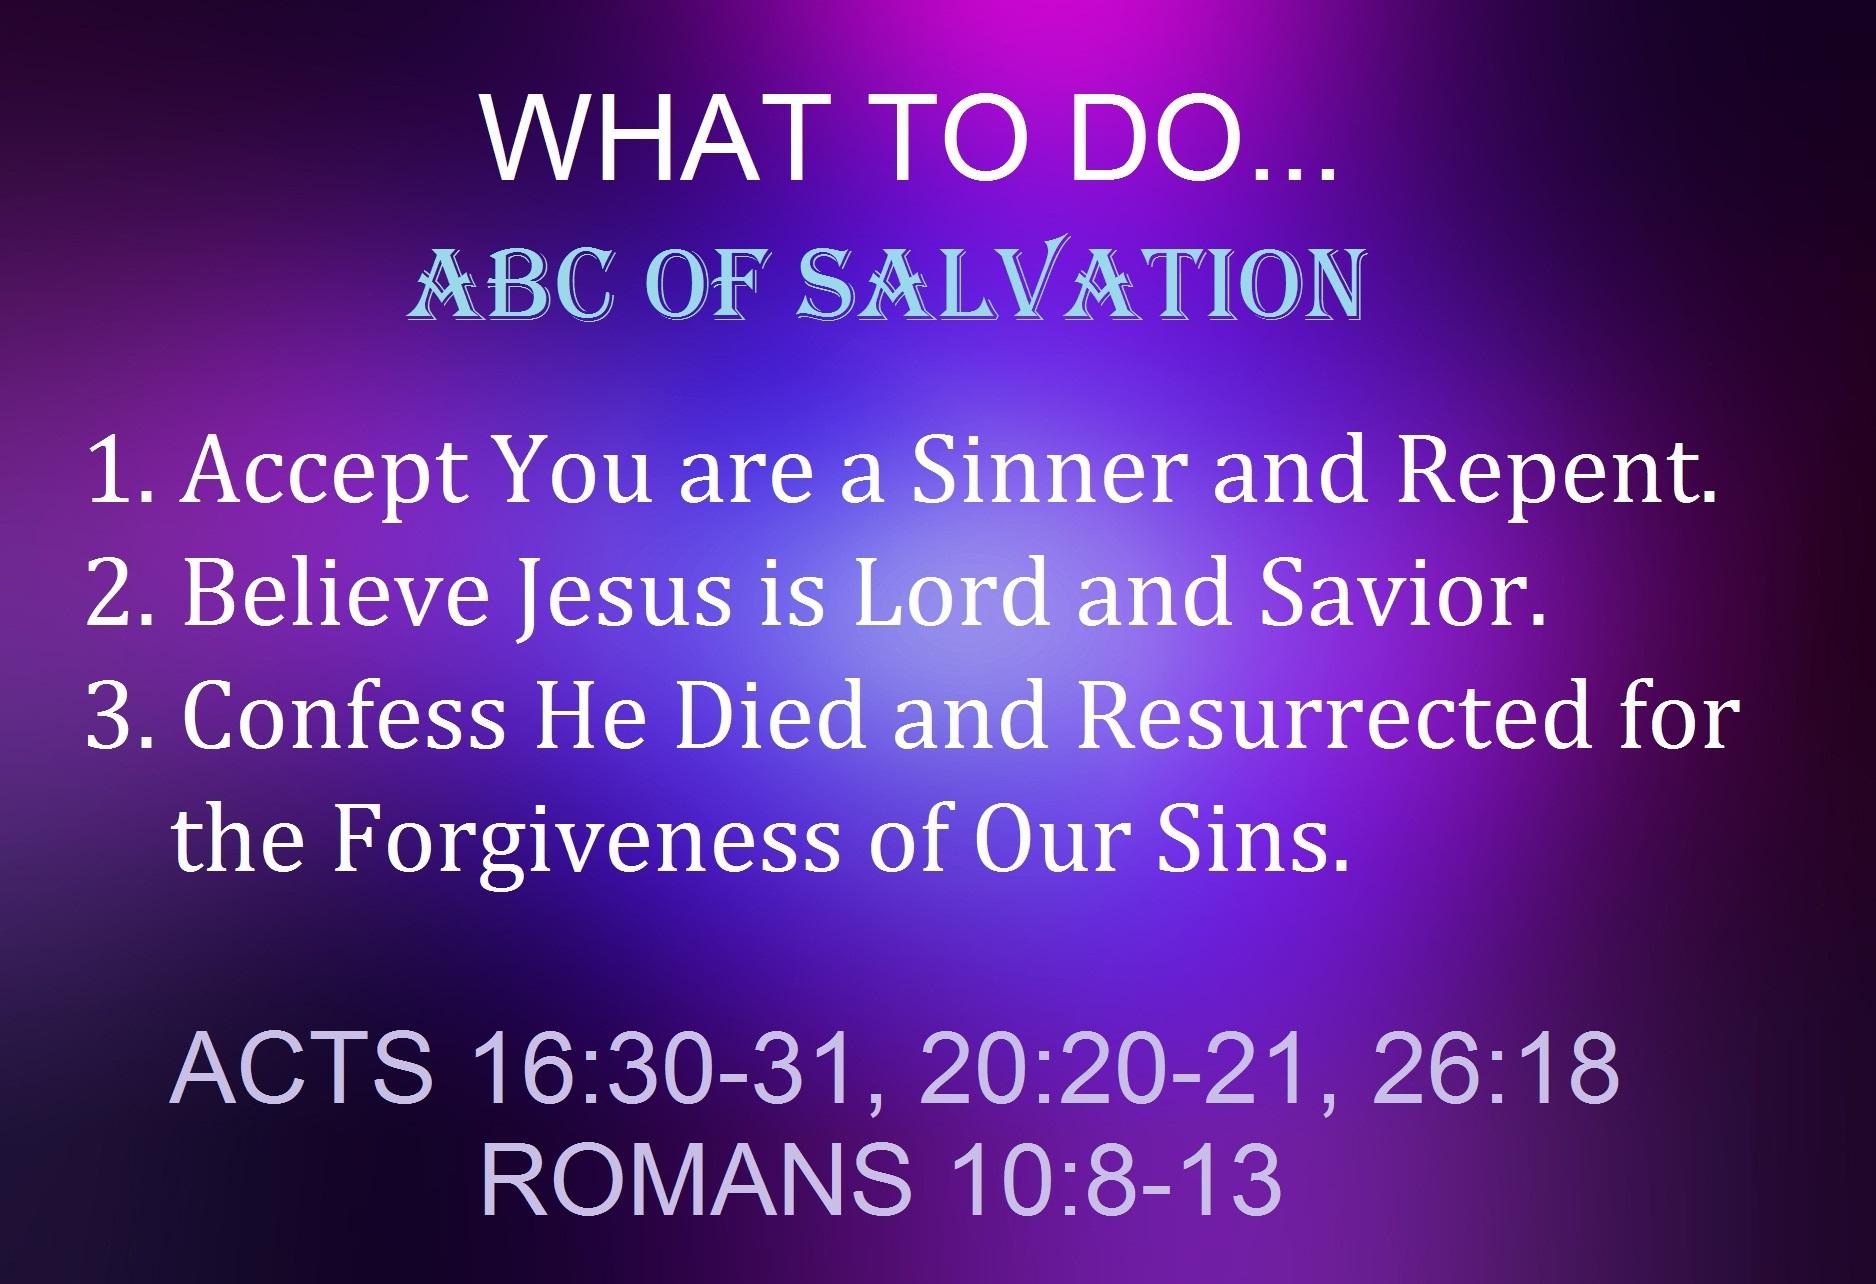 abc-of-salvation.jpg